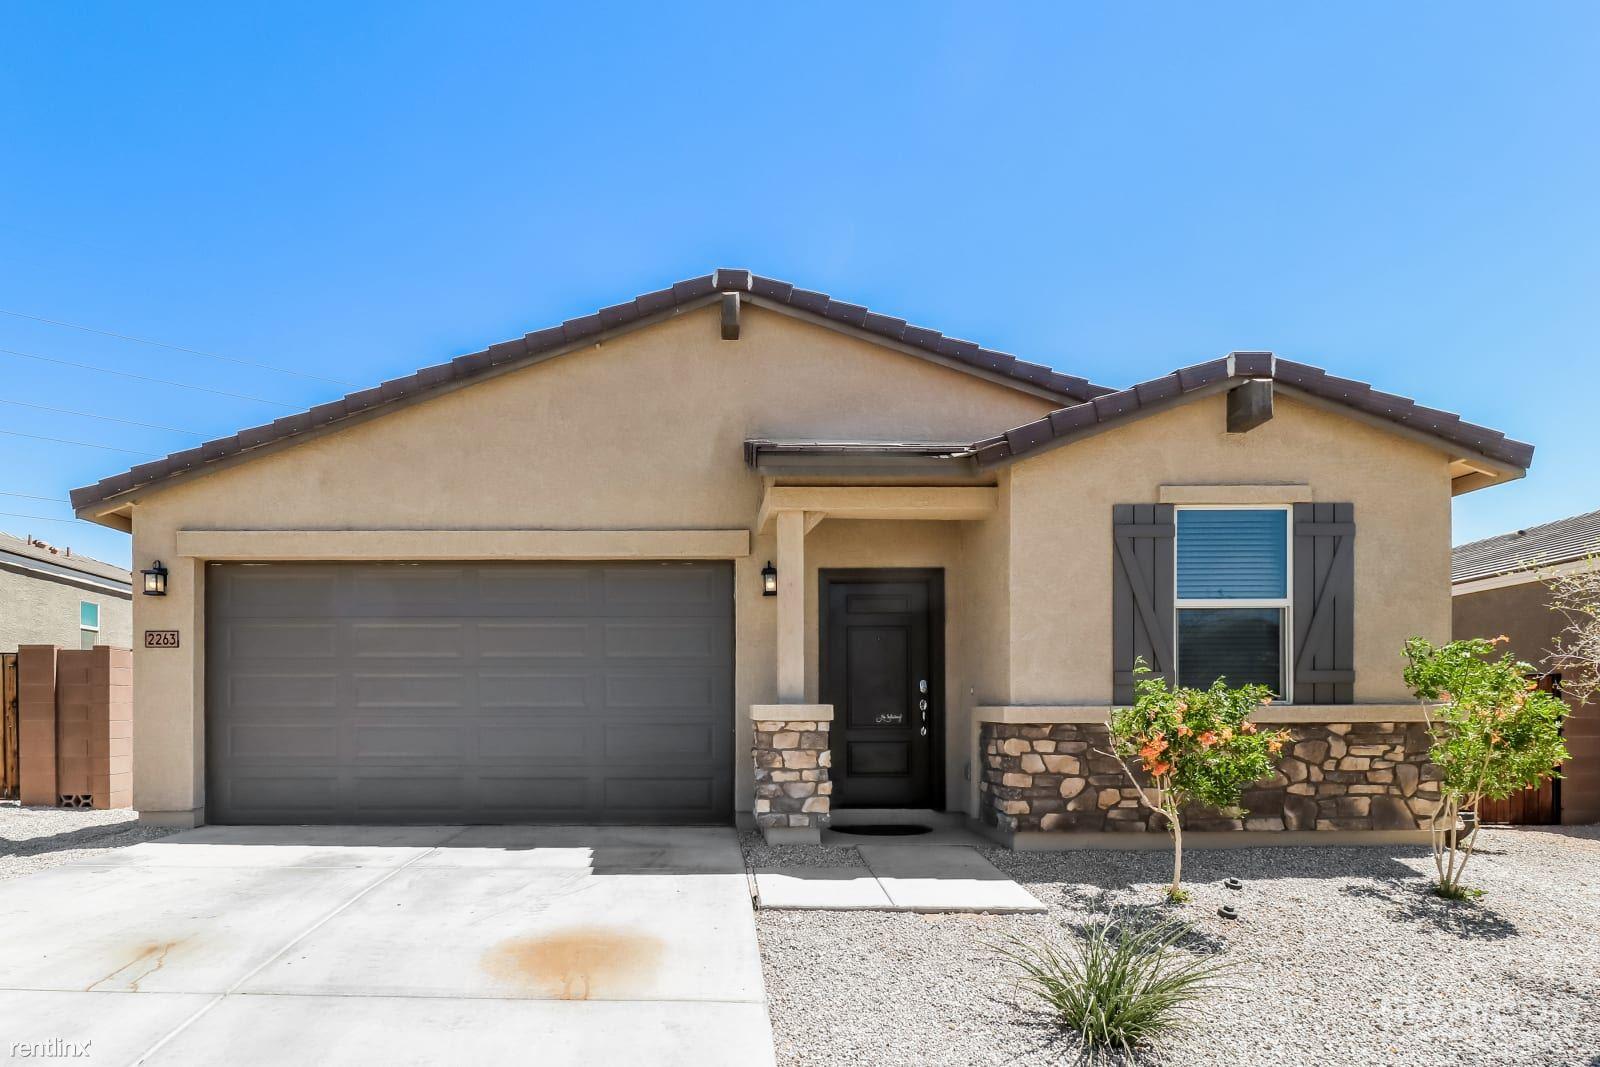 2263 S 236th Drive, Buckeye, AZ - 1,949 USD/ month